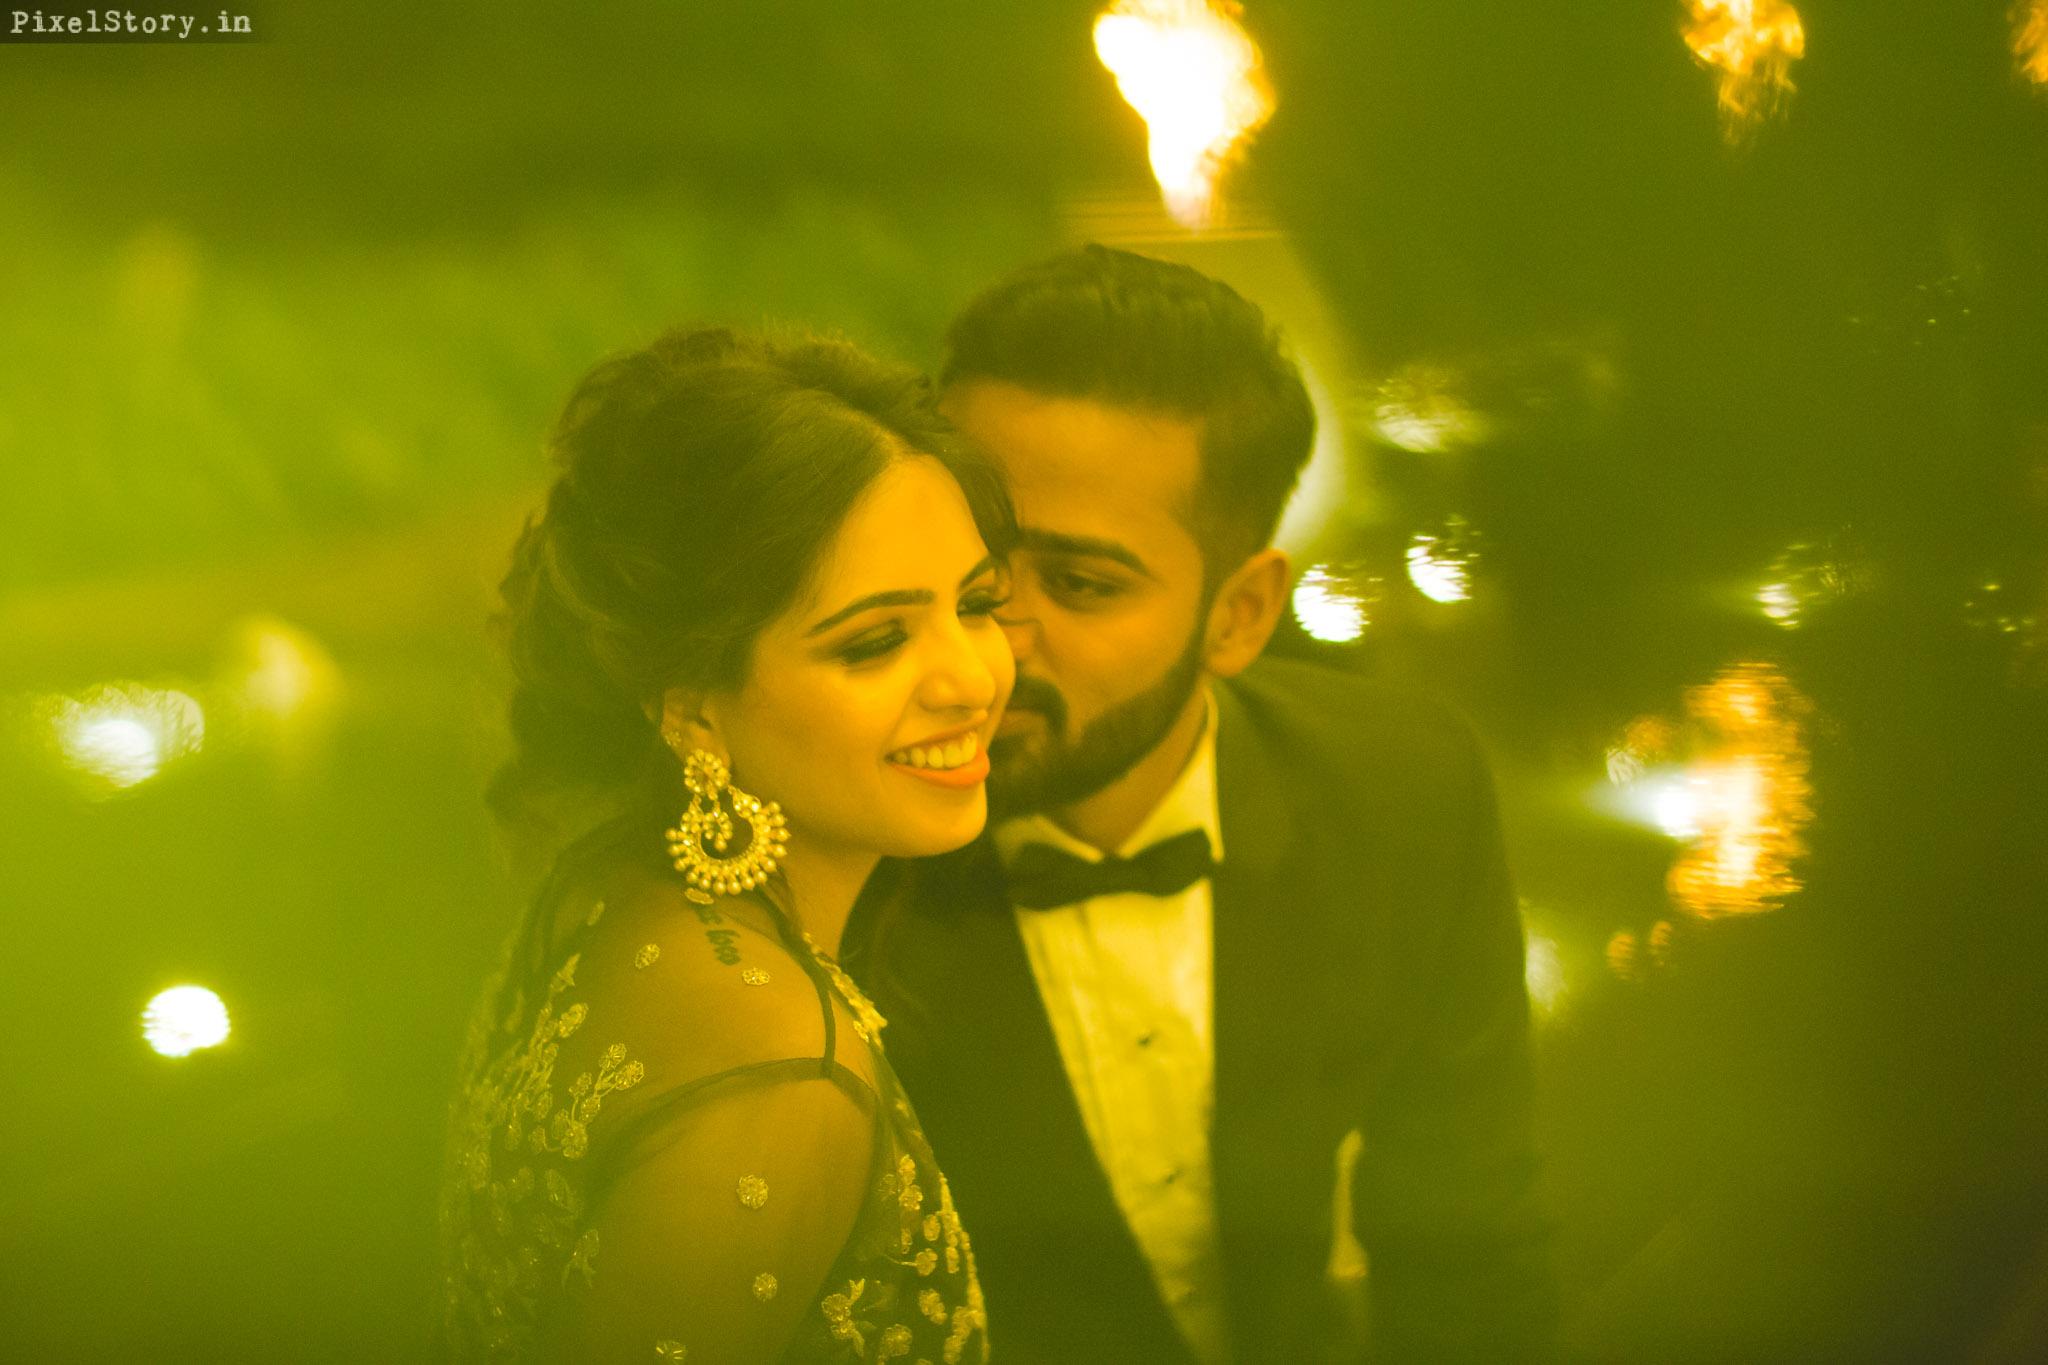 PixelStory-Engagement-Ritz-Carlton-Preksha-Bharath-014.jpg